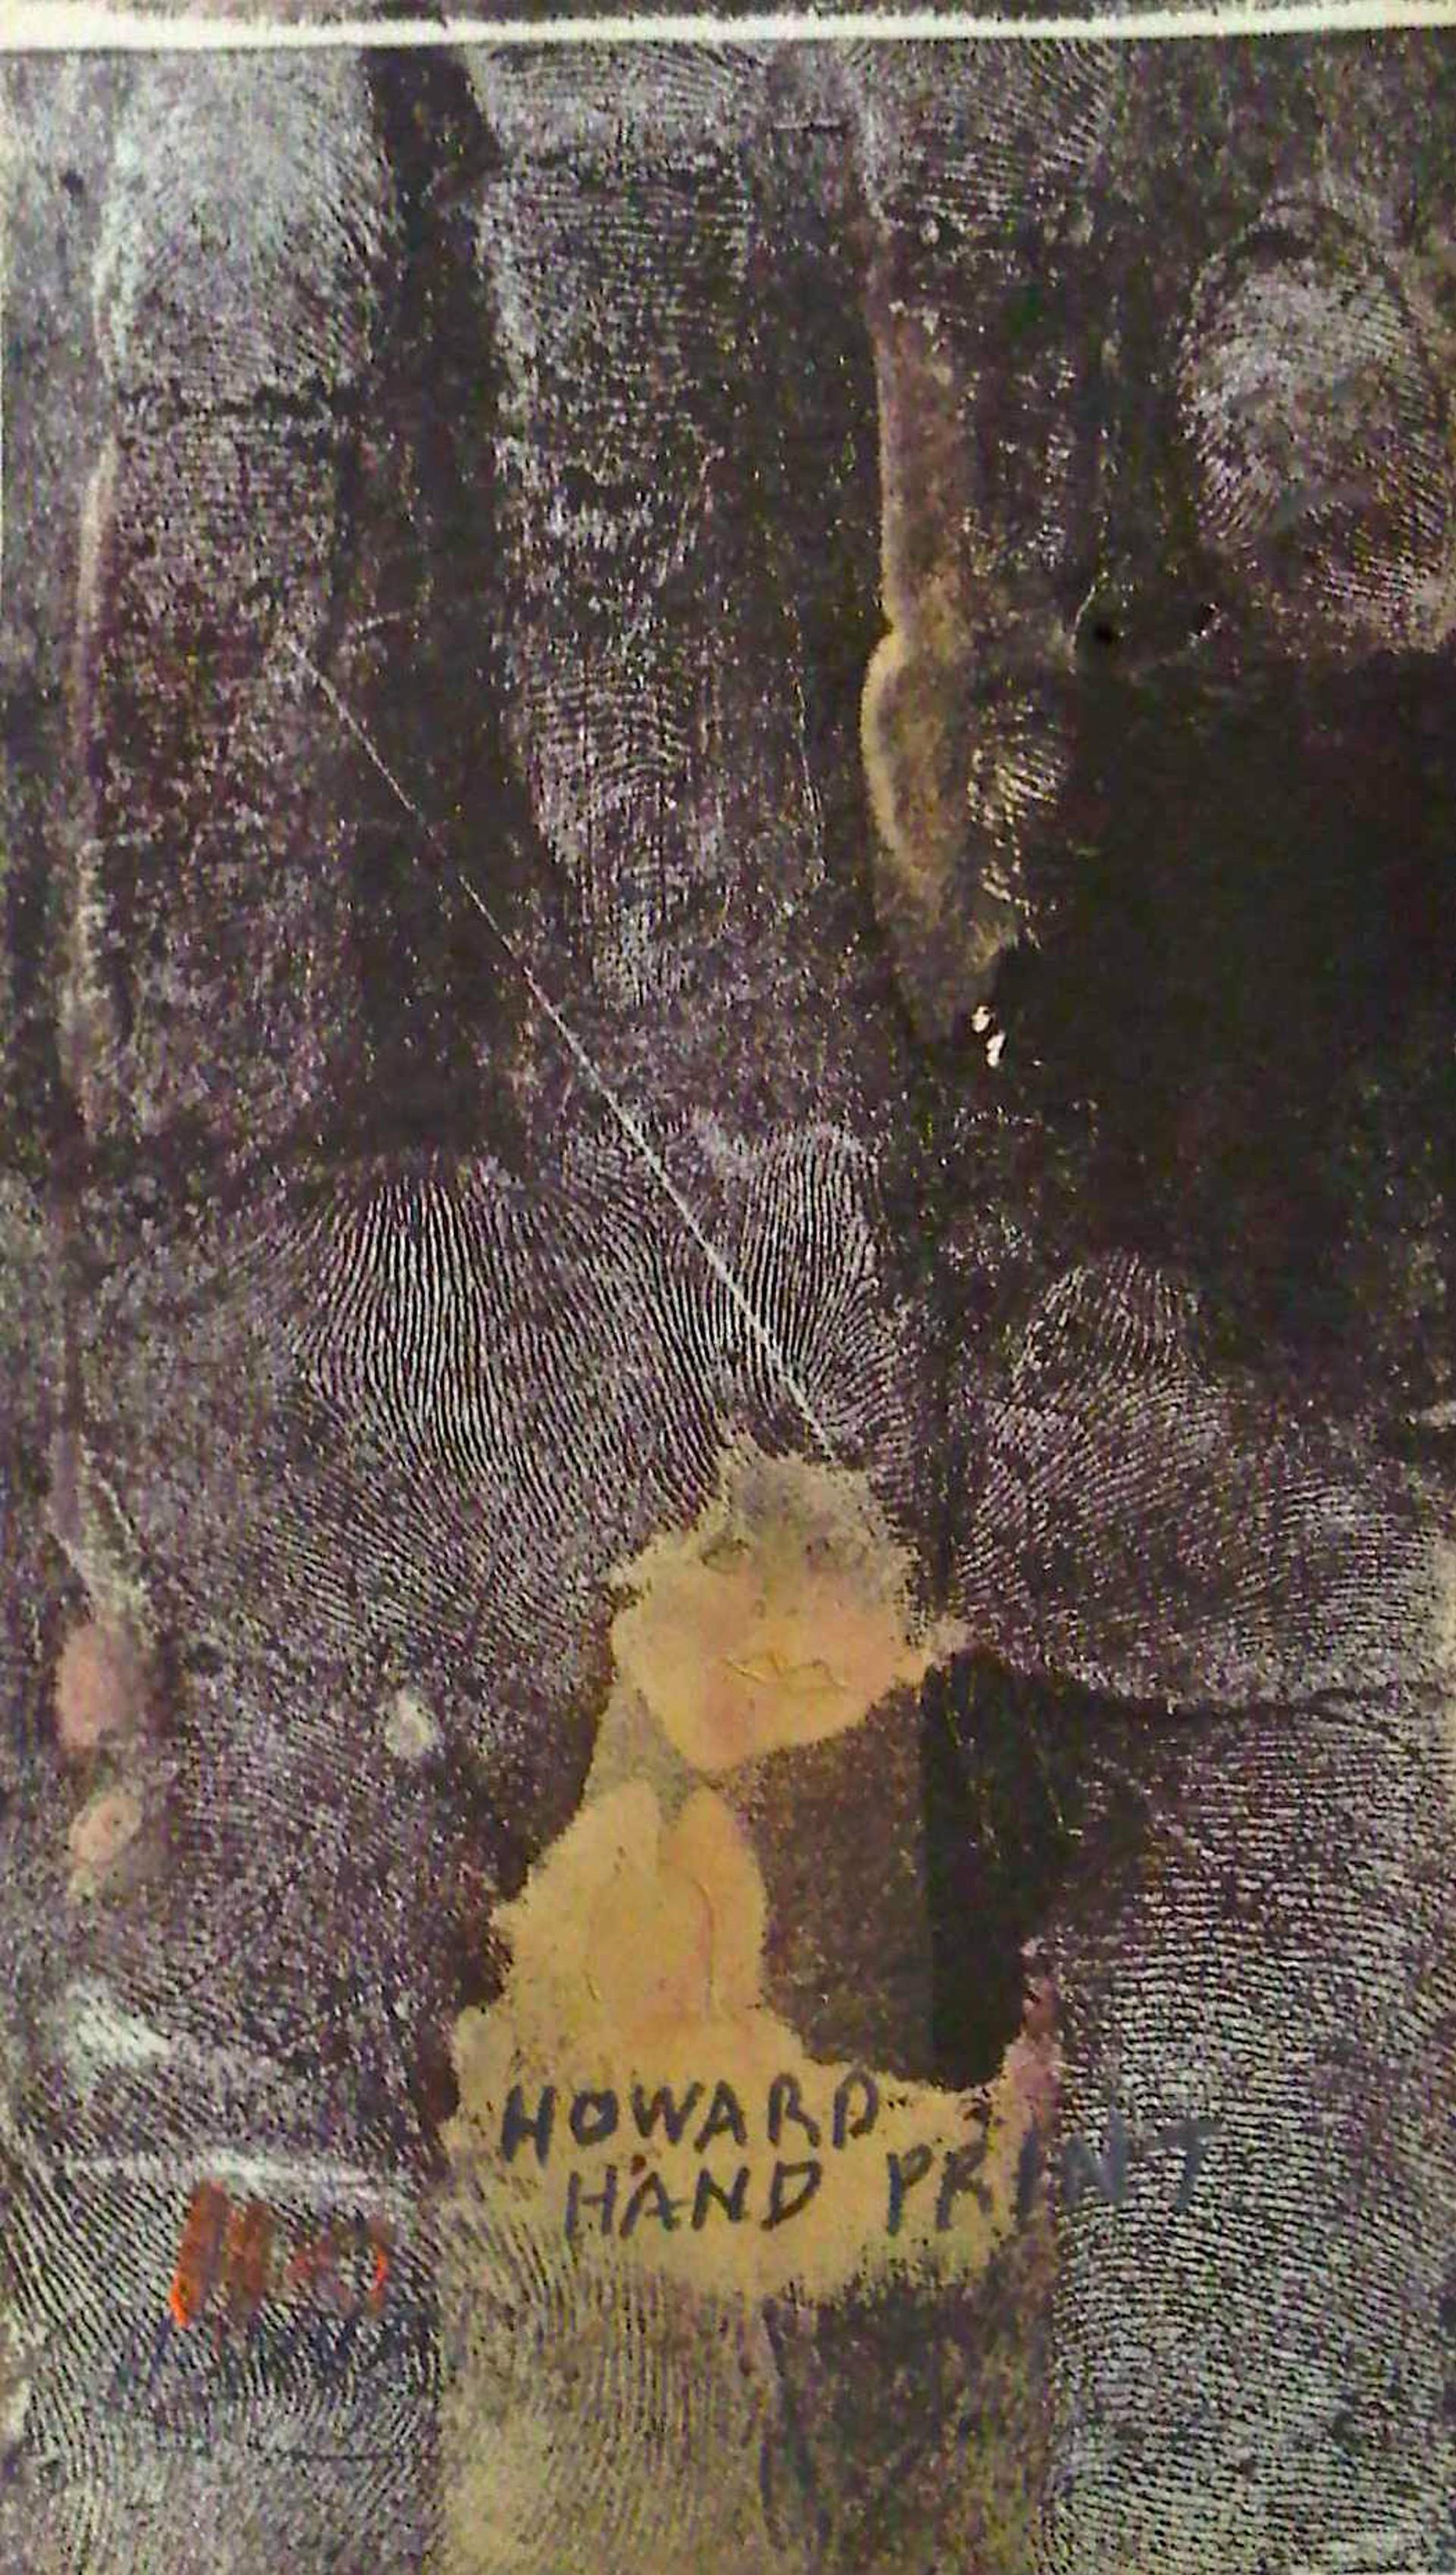 Howard's Hand Print by Howard Finster